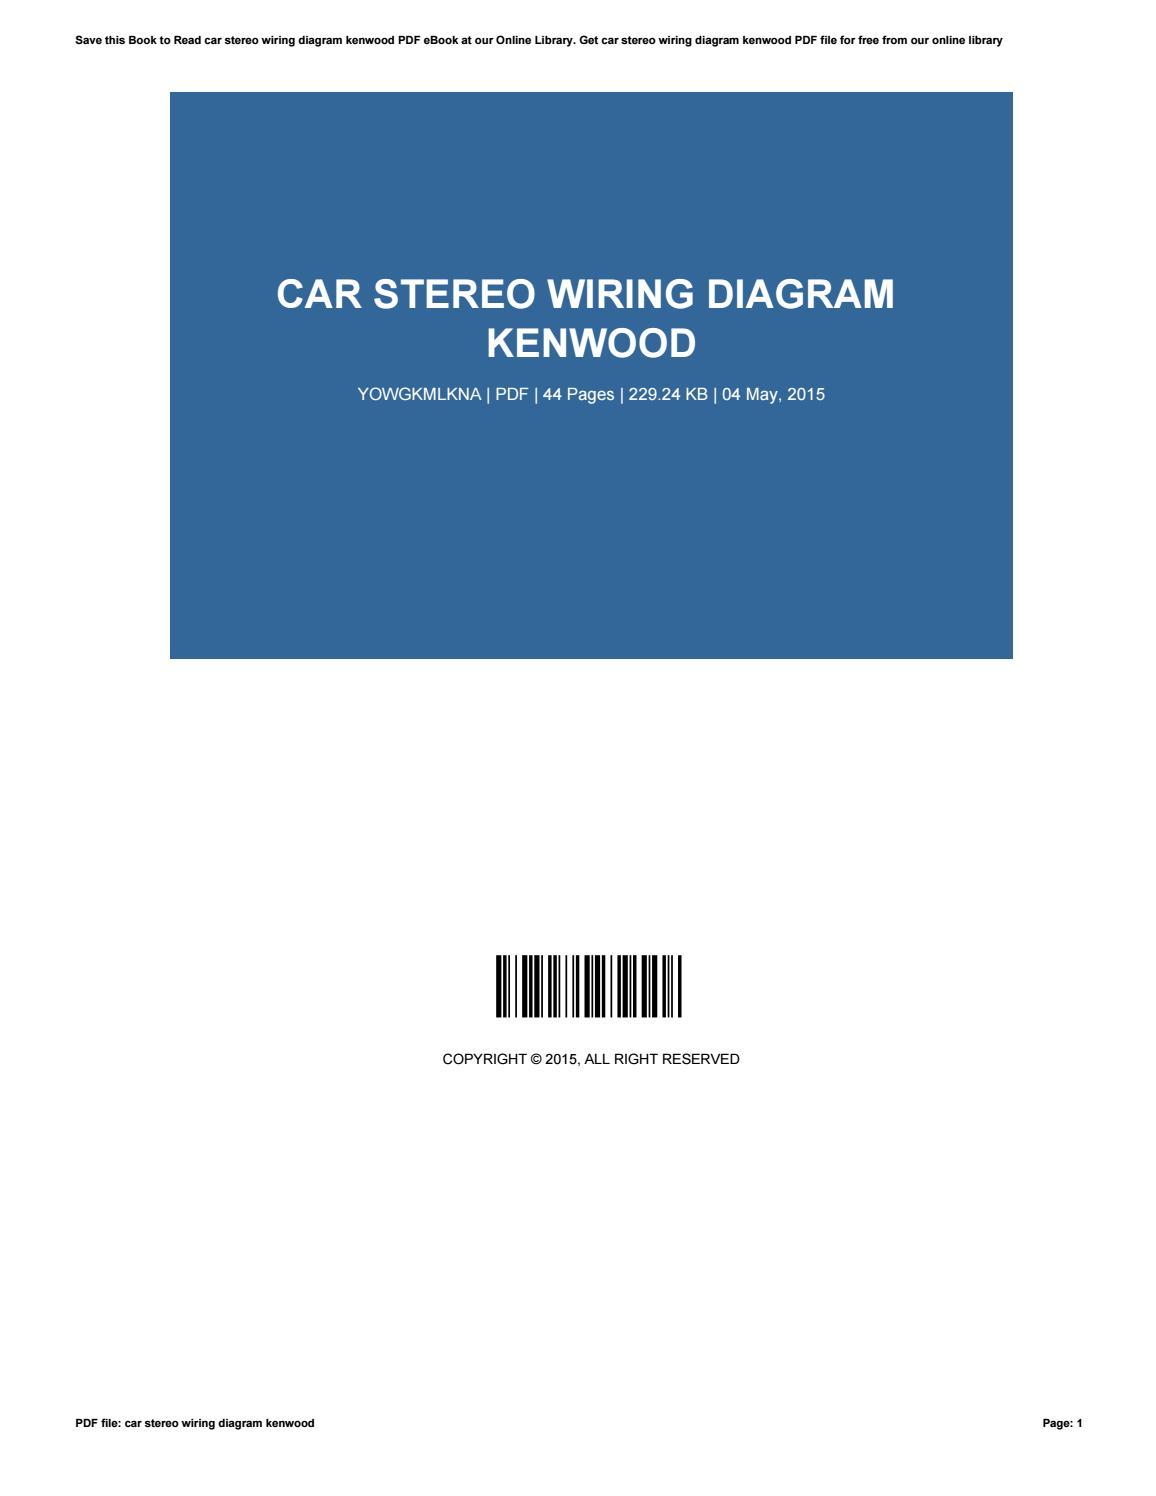 100 Kenwood Car Stereo Wiring Harness Diagram – Kenwood Wiring Diagram Pdf